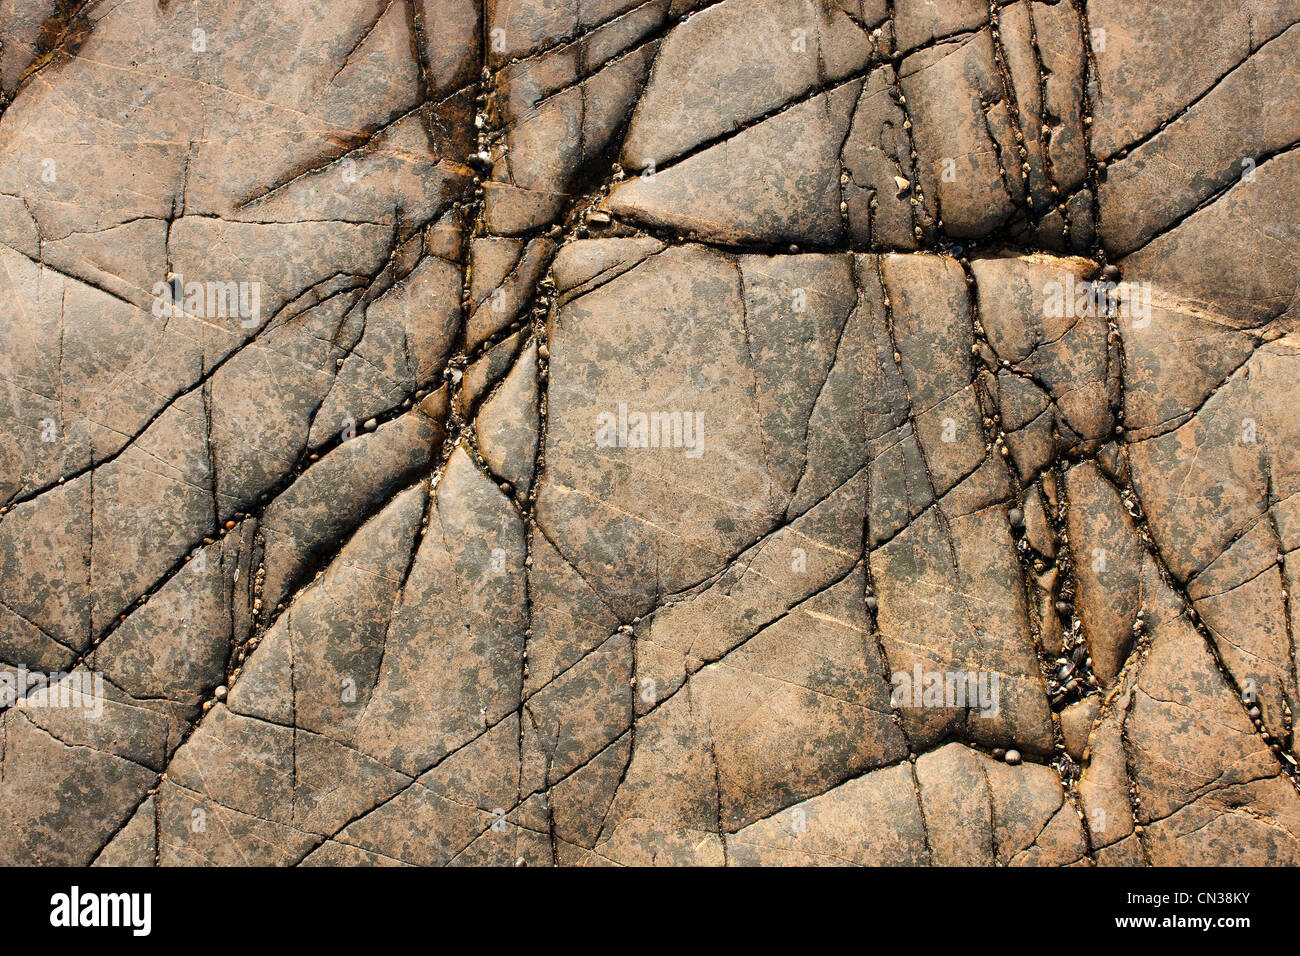 Cracked rock - Stock Image